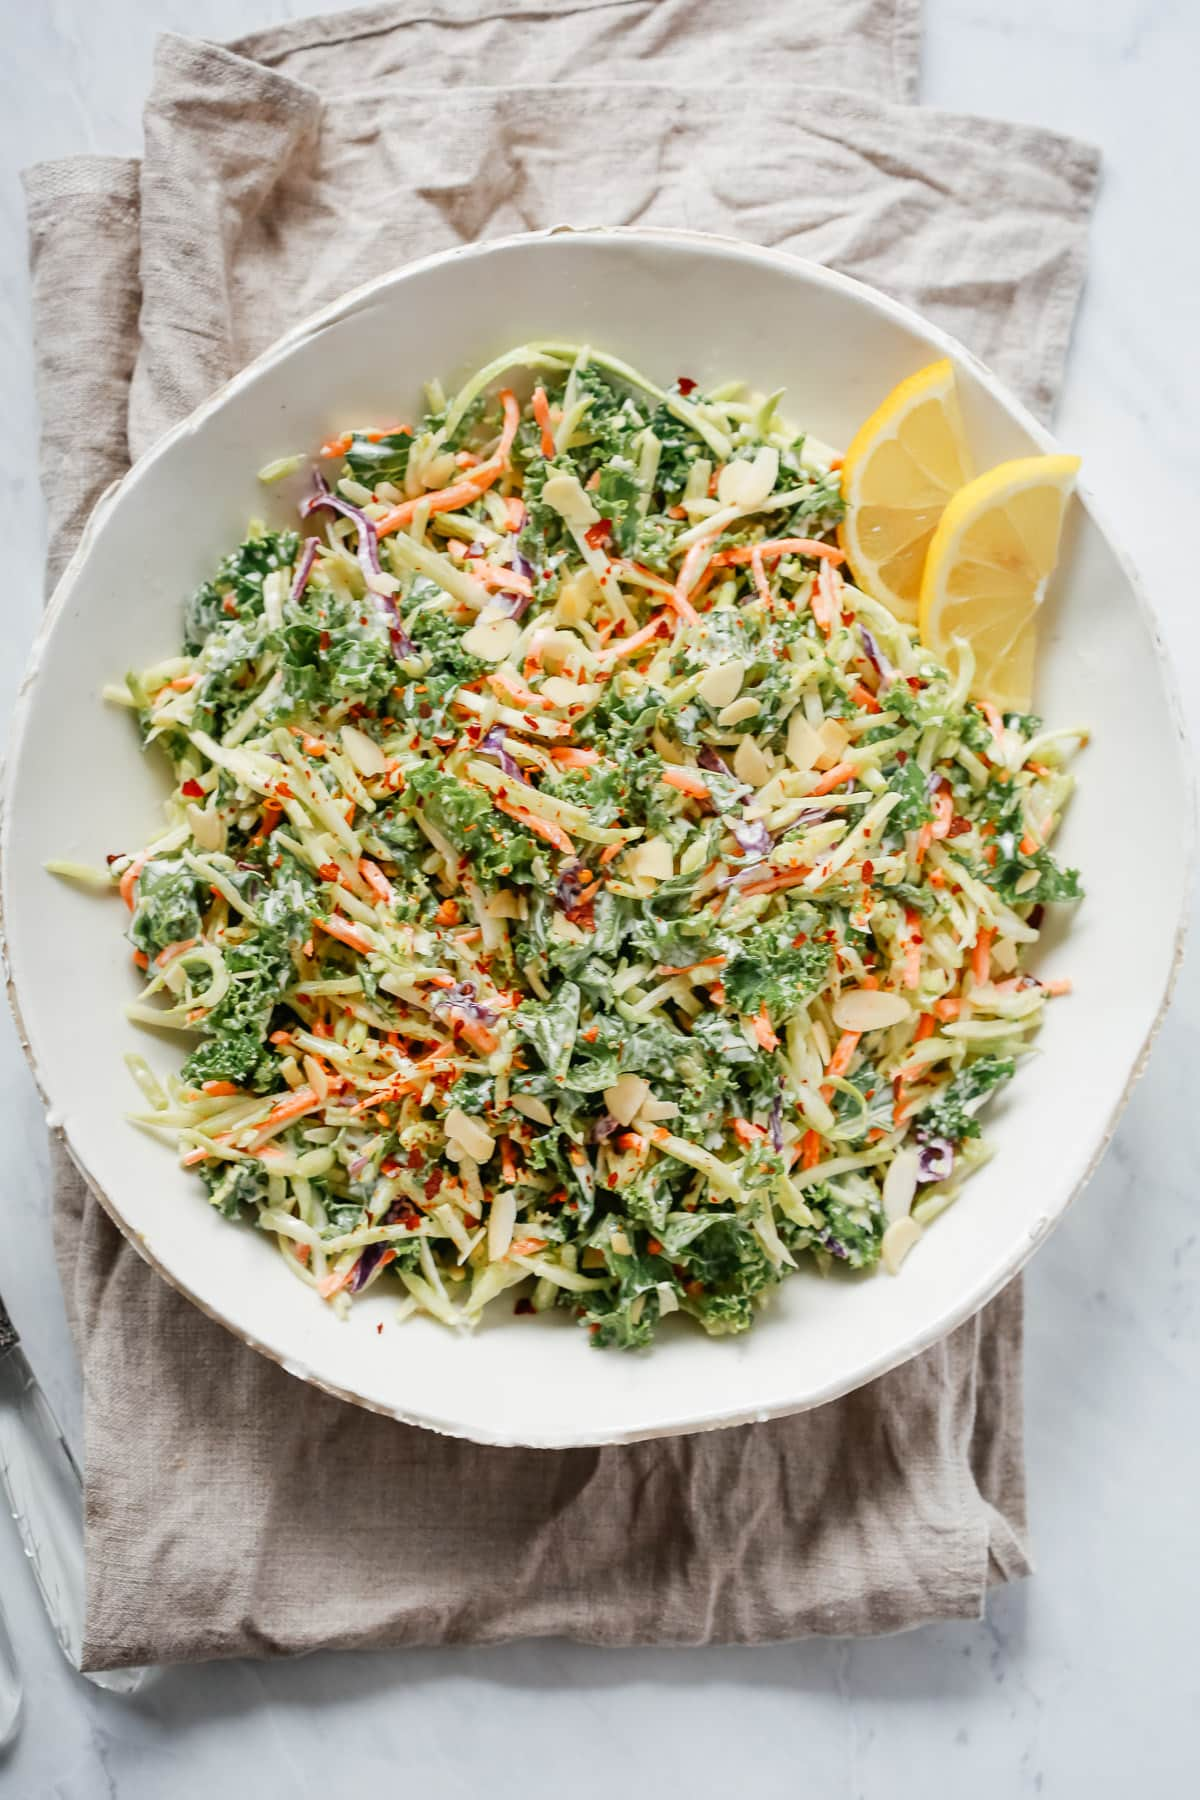 Super Easy Broccoli Kale Slaw Salad.